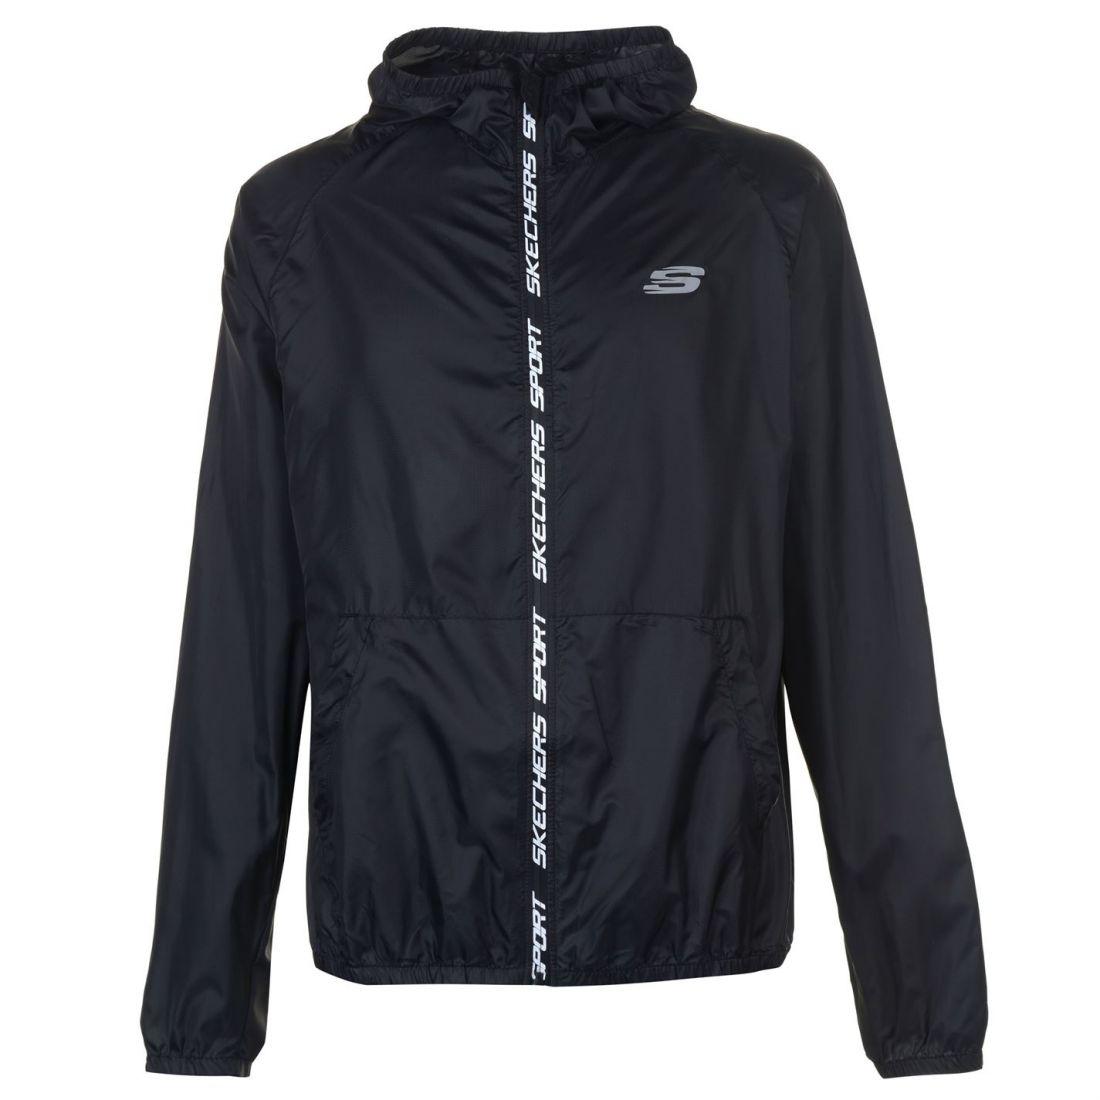 Skechers Mens Lightweight Jacket